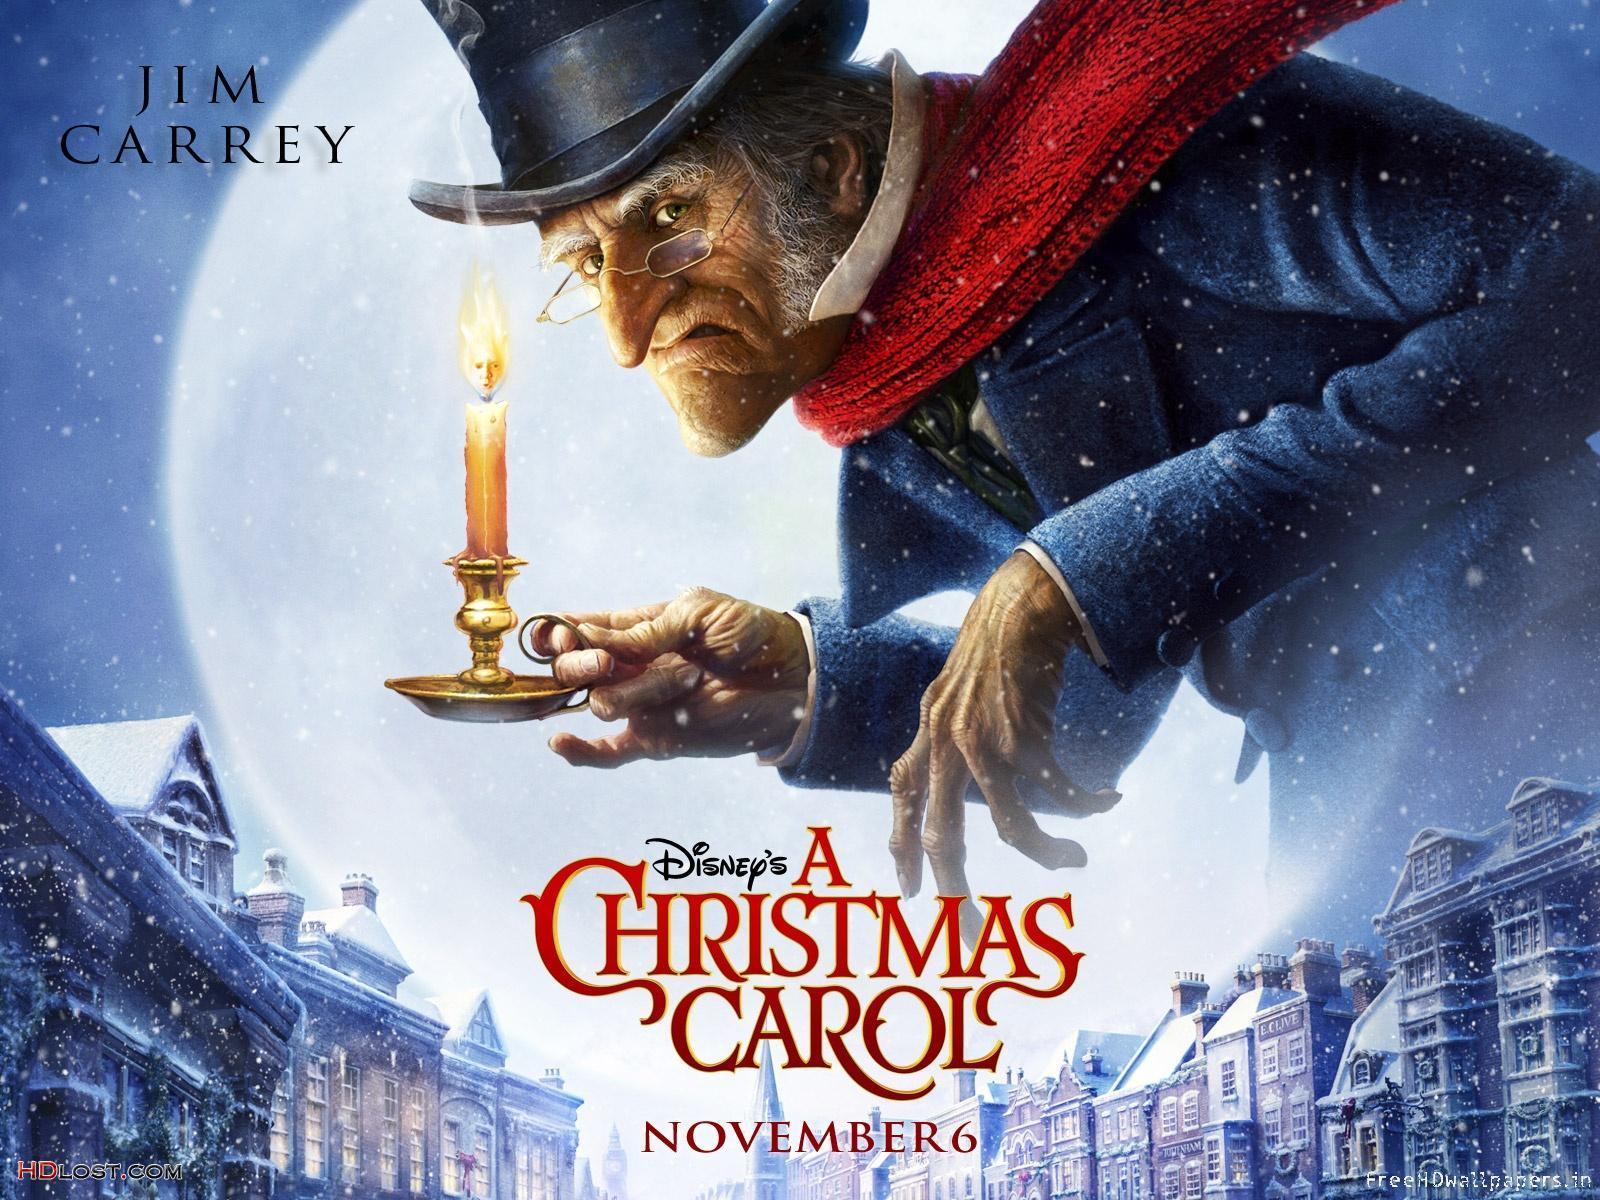 http://3.bp.blogspot.com/-jNFY2QQm-cg/TtZaN6qjuBI/AAAAAAAABvk/QI7gpD-fB30/s1600/wallpaper-fond-ecran-A+Christmas+Carol+Wallpaper-1600x1200-HD.jpg